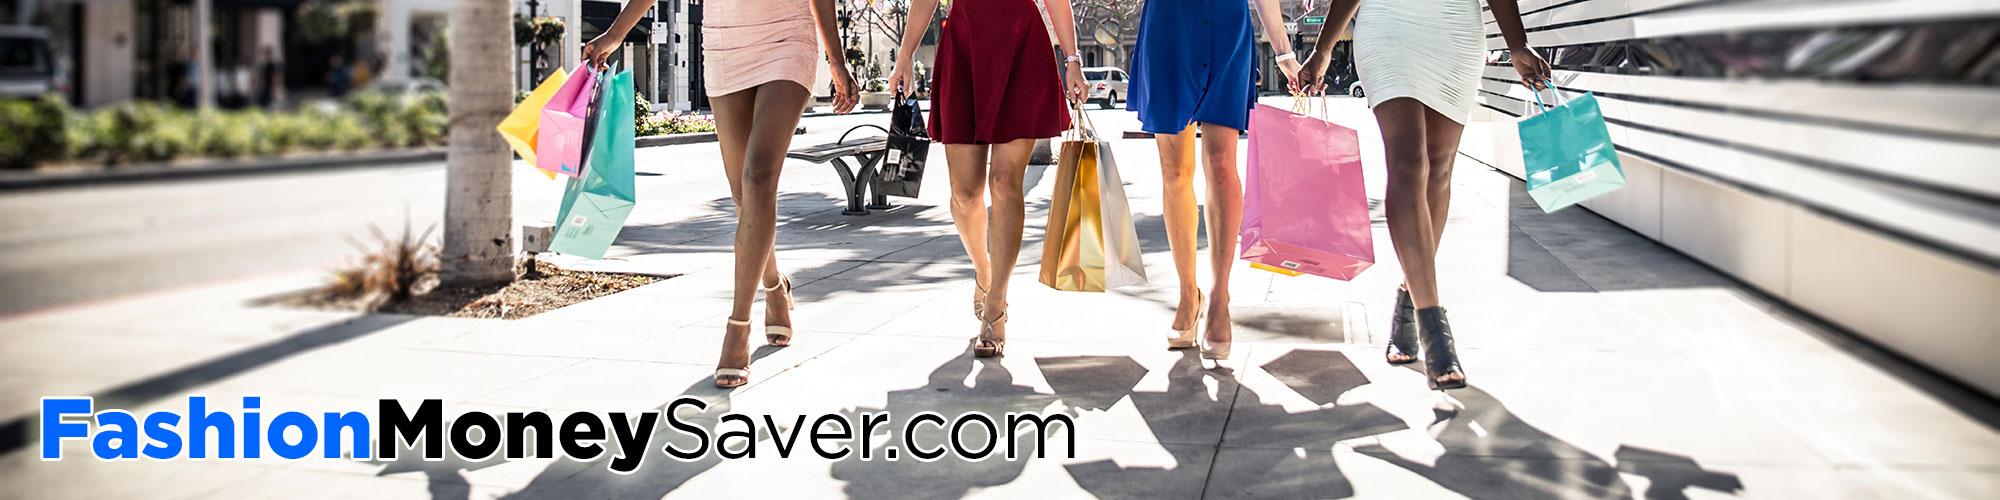 Fashion Shopping for Designer Brands